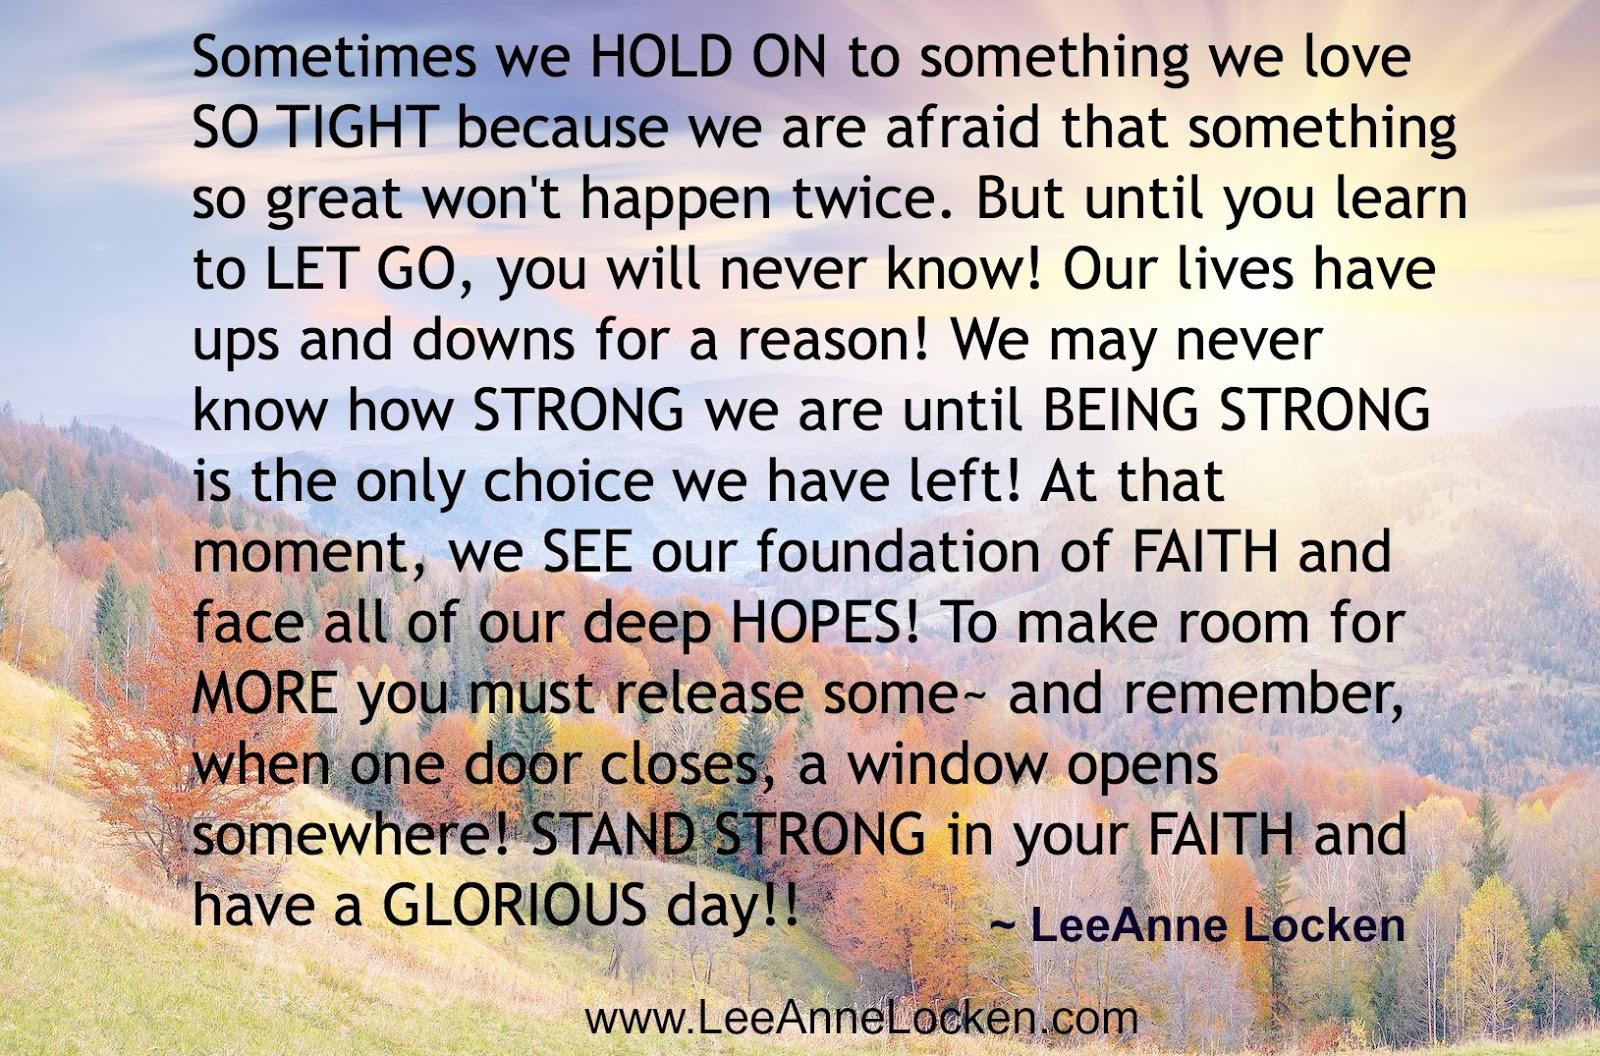 Inspiration By Leeanne Locken Thursdays Inspiration 110713 Why